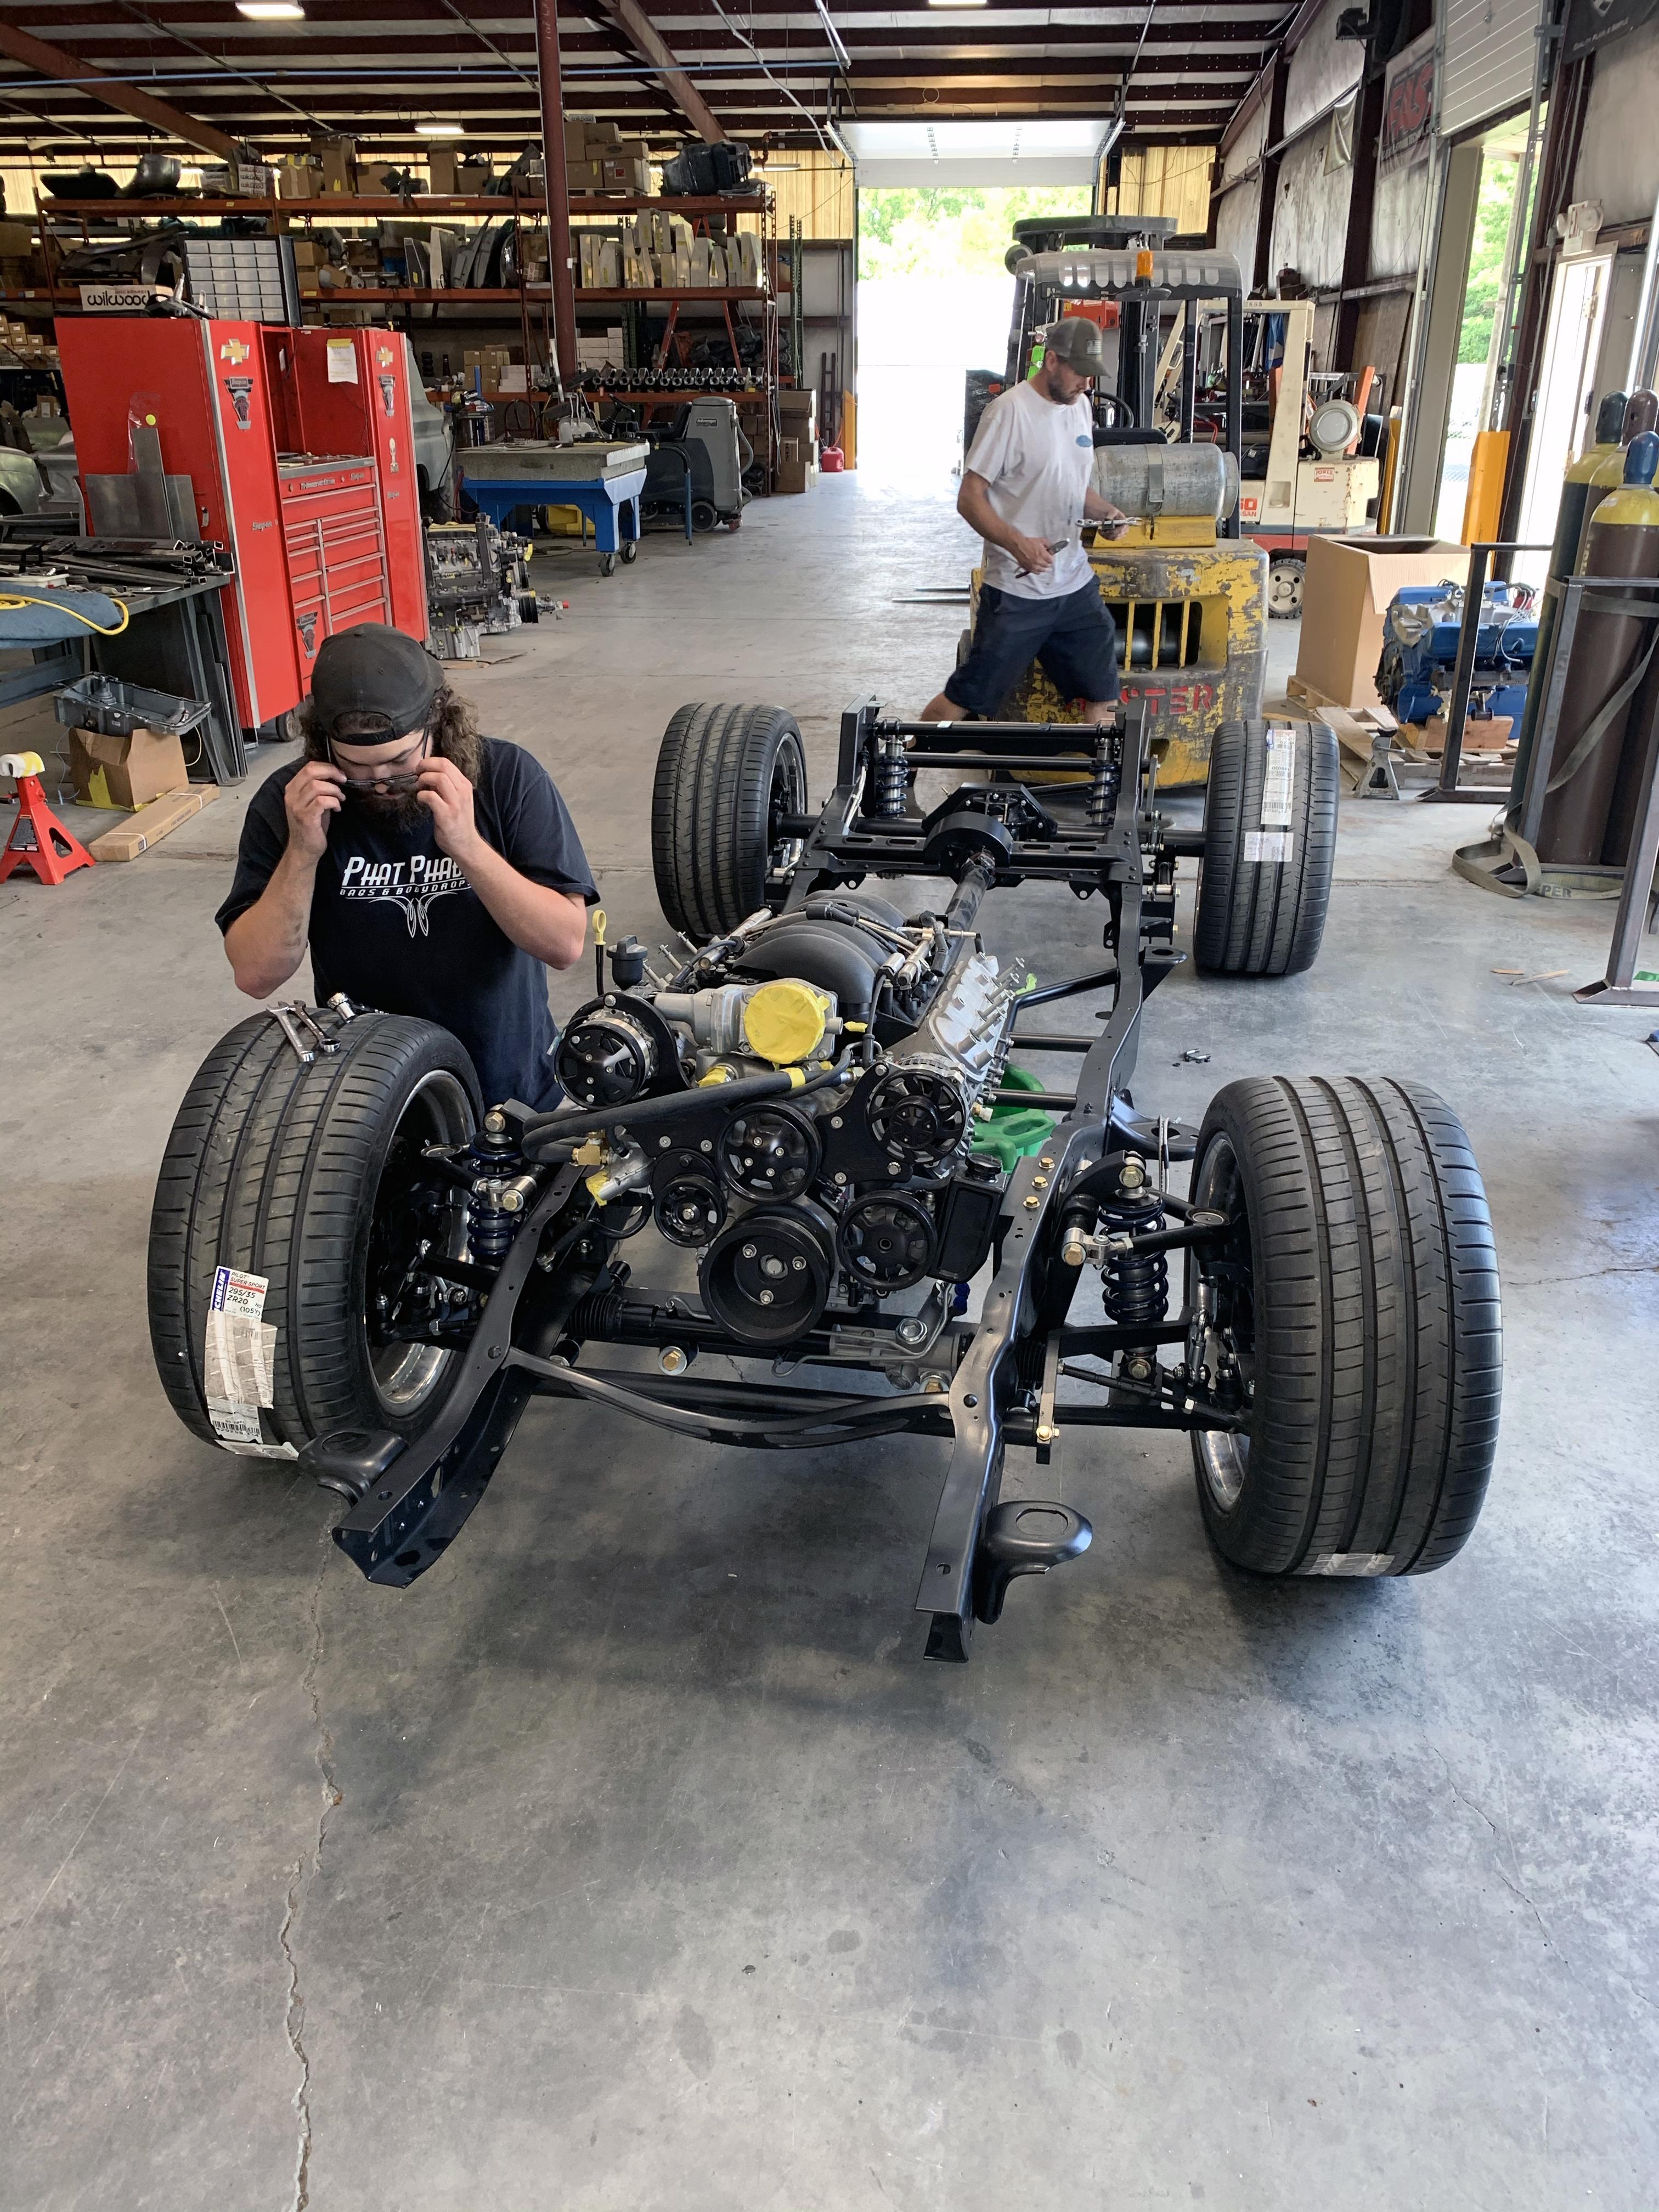 Scotts-Hotrods-82-C10-Blazer-2WD-38